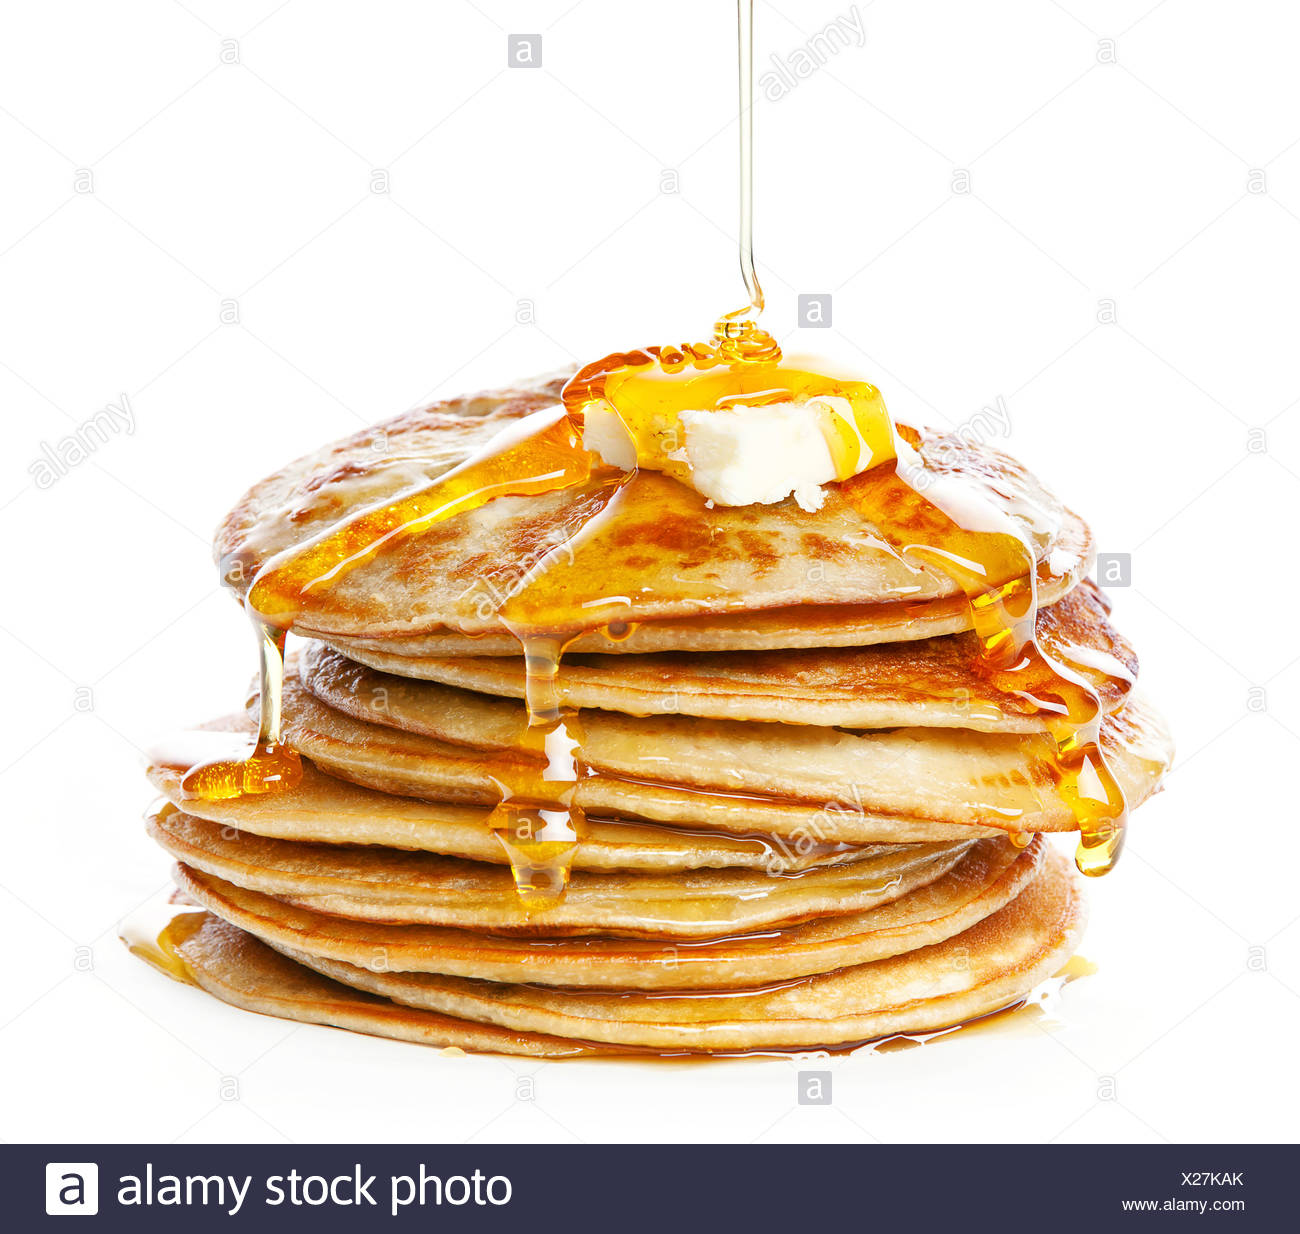 Pila de pequeñas tortitas en almíbar sobre fondo blanco. Imagen De Stock